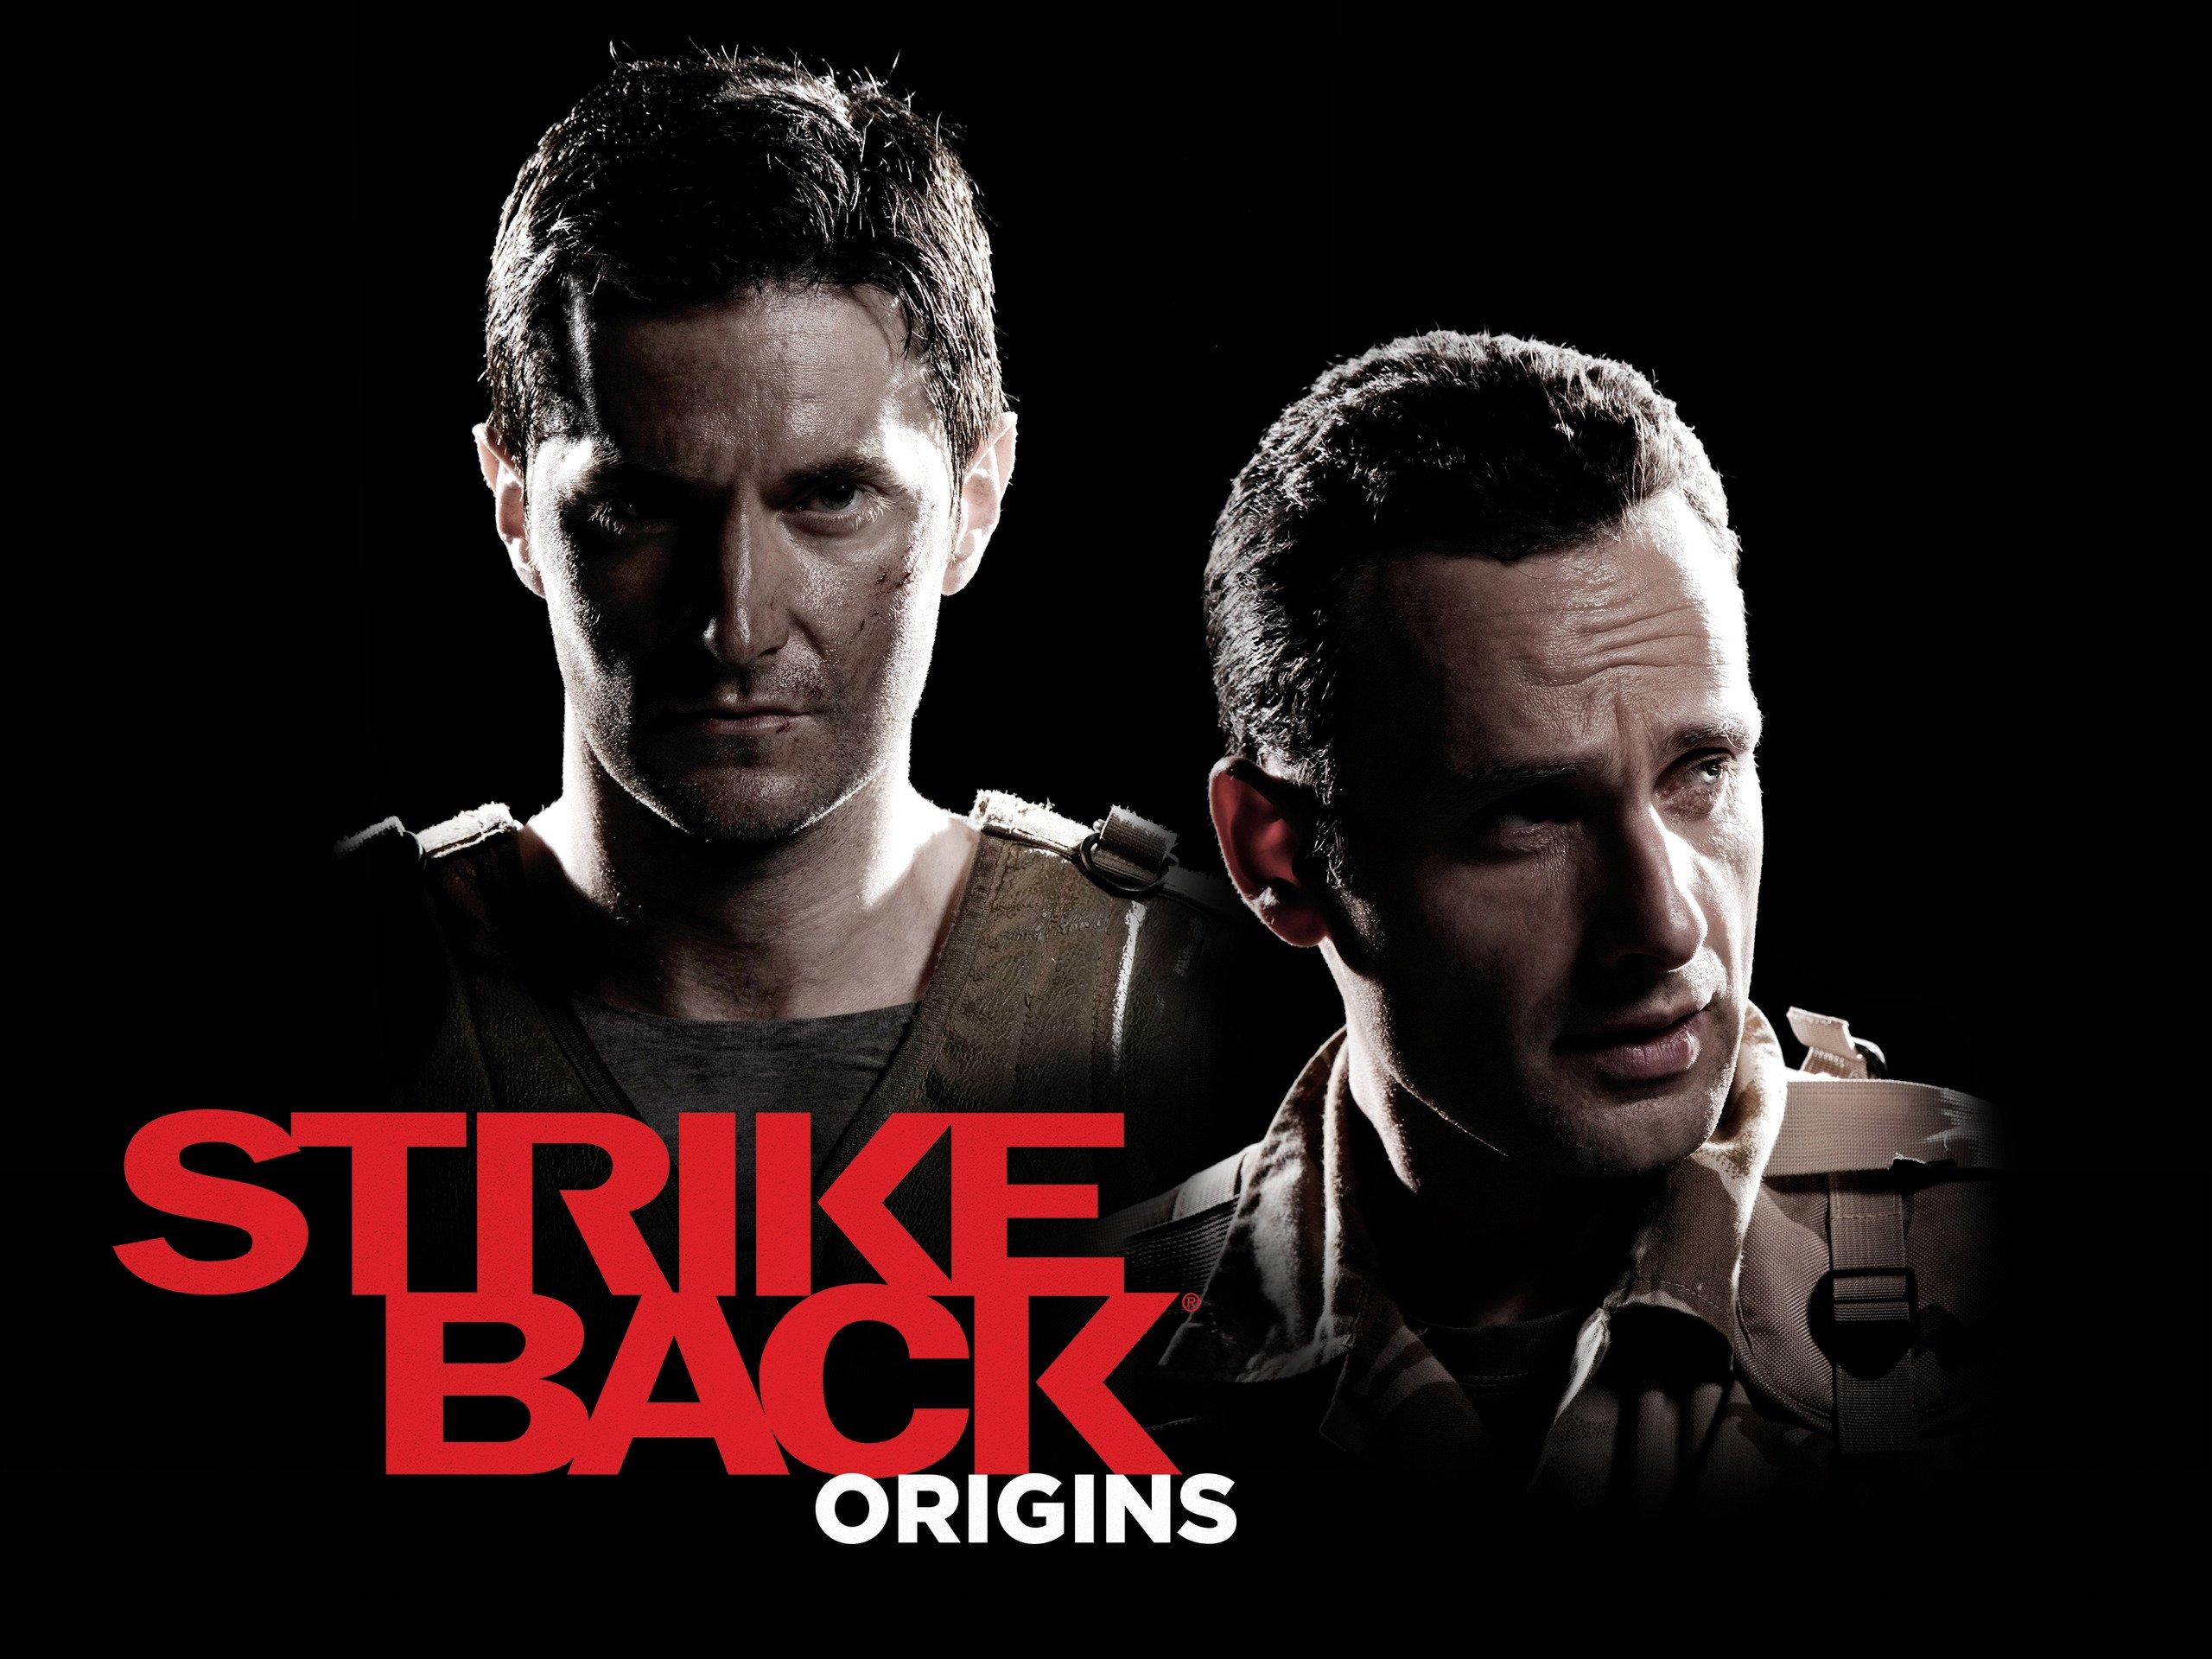 Strike back: Origins S01